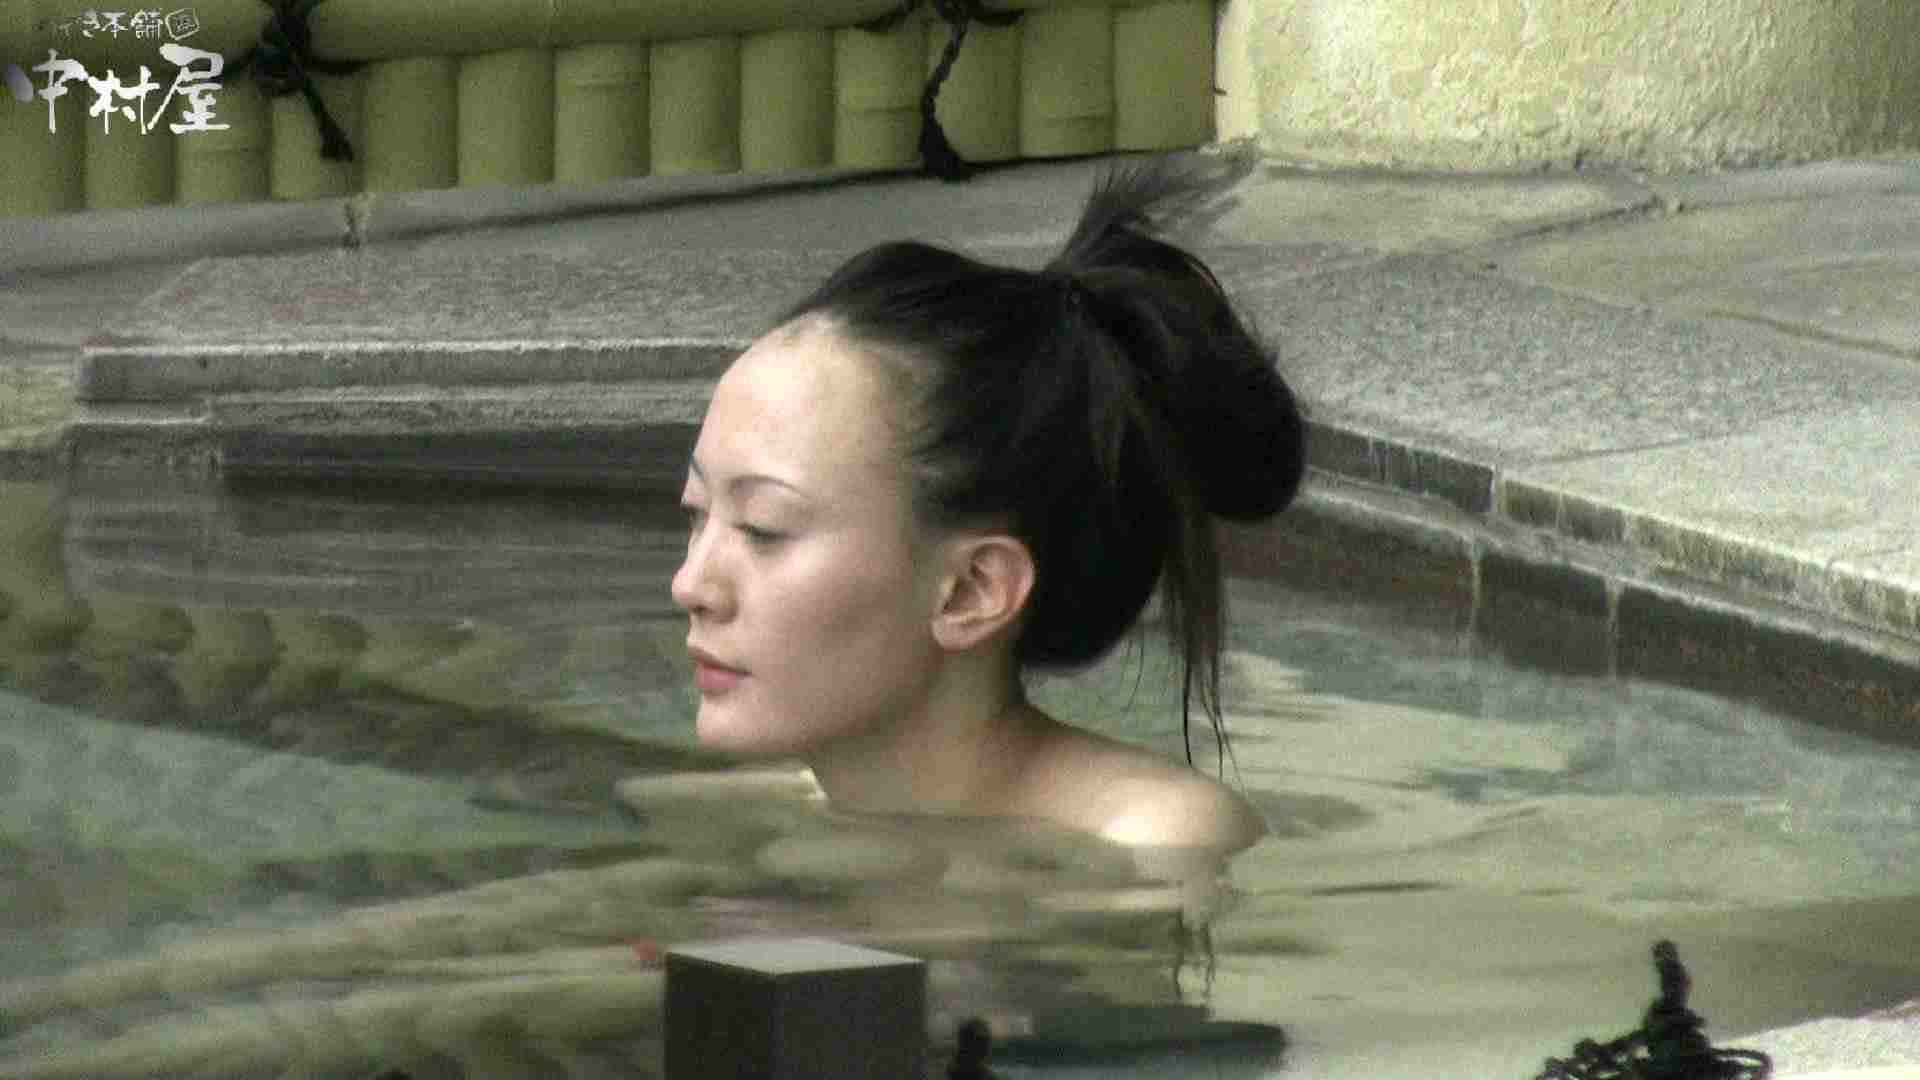 Aquaな露天風呂Vol.900 OLのエロ生活 すけべAV動画紹介 88連発 56